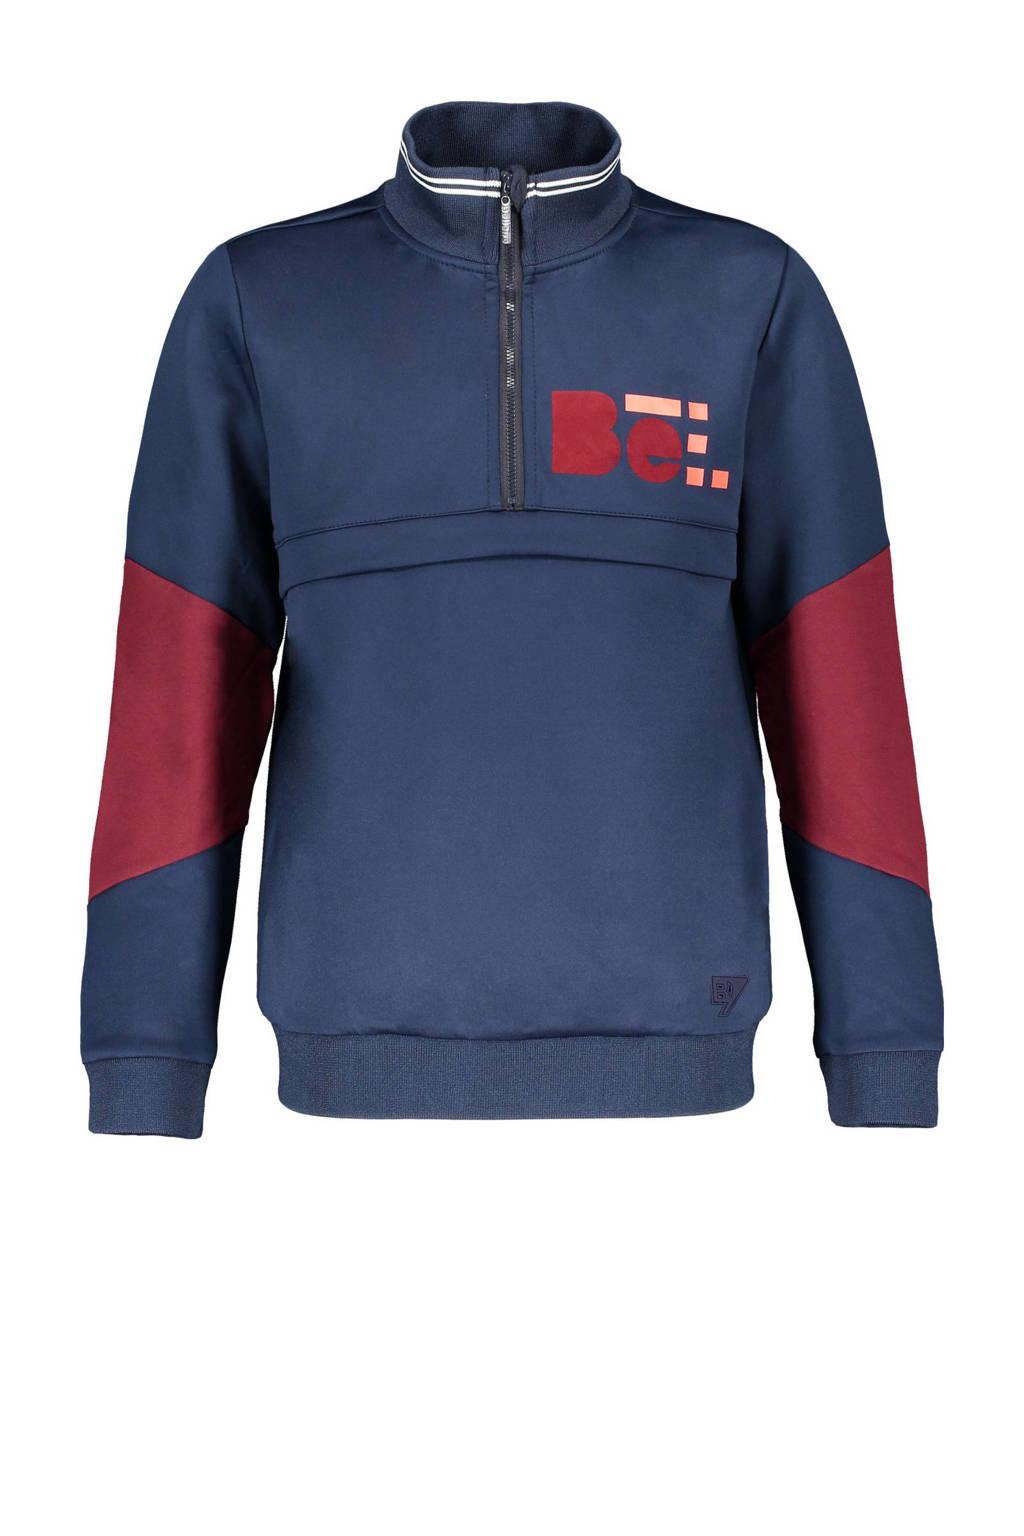 Bellaire sweater Kennis met printopdruk donkerblauw/donkerrood, Donkerblauw/donkerrood